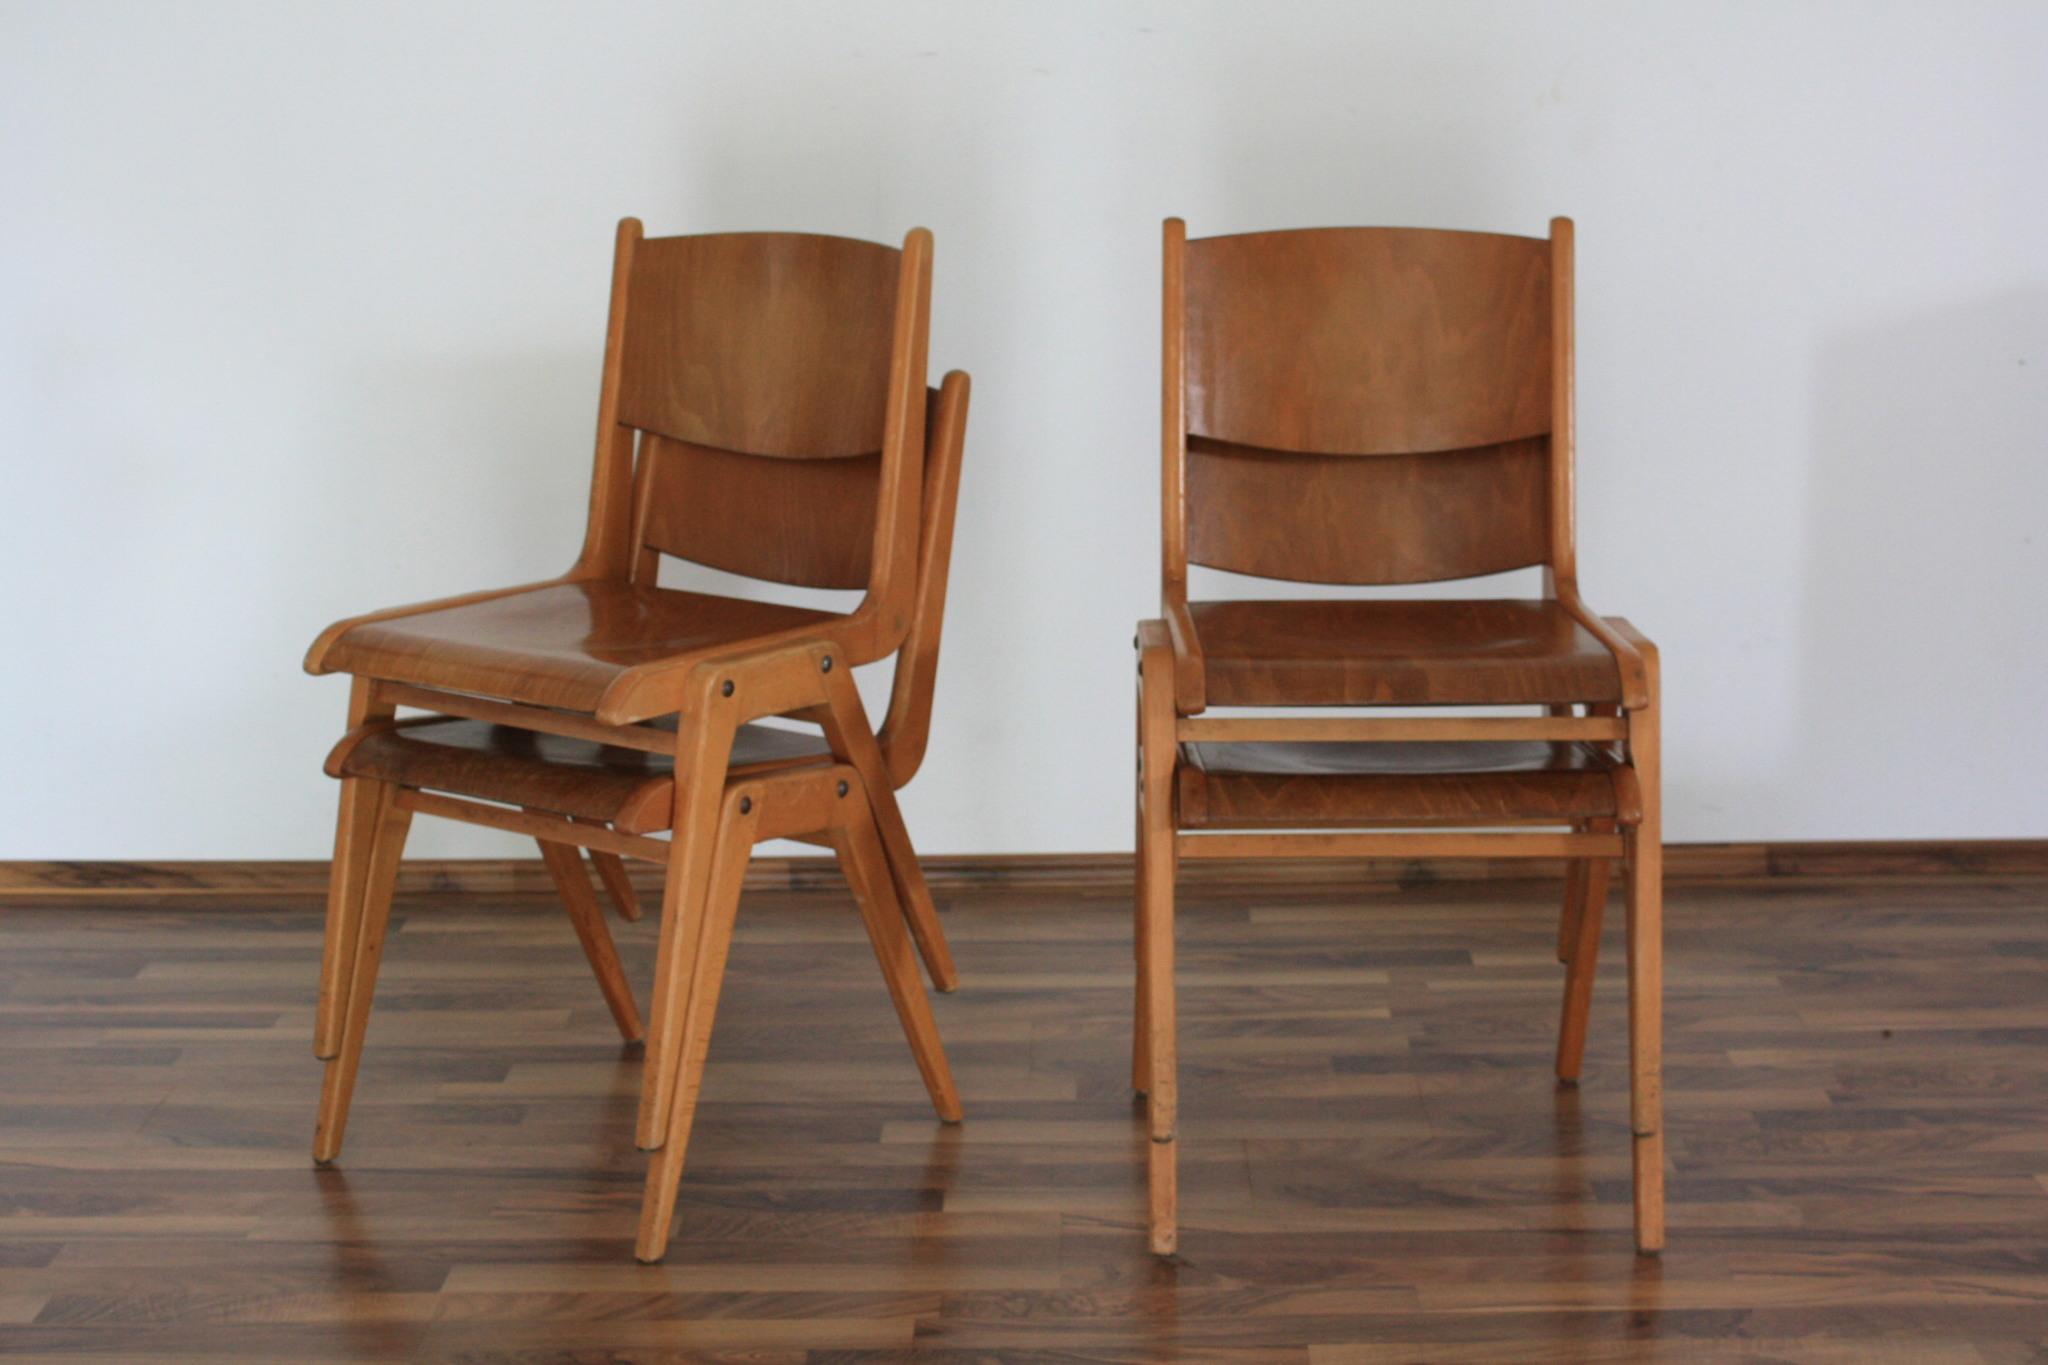 Holz Stühle Buche Stapel (21)